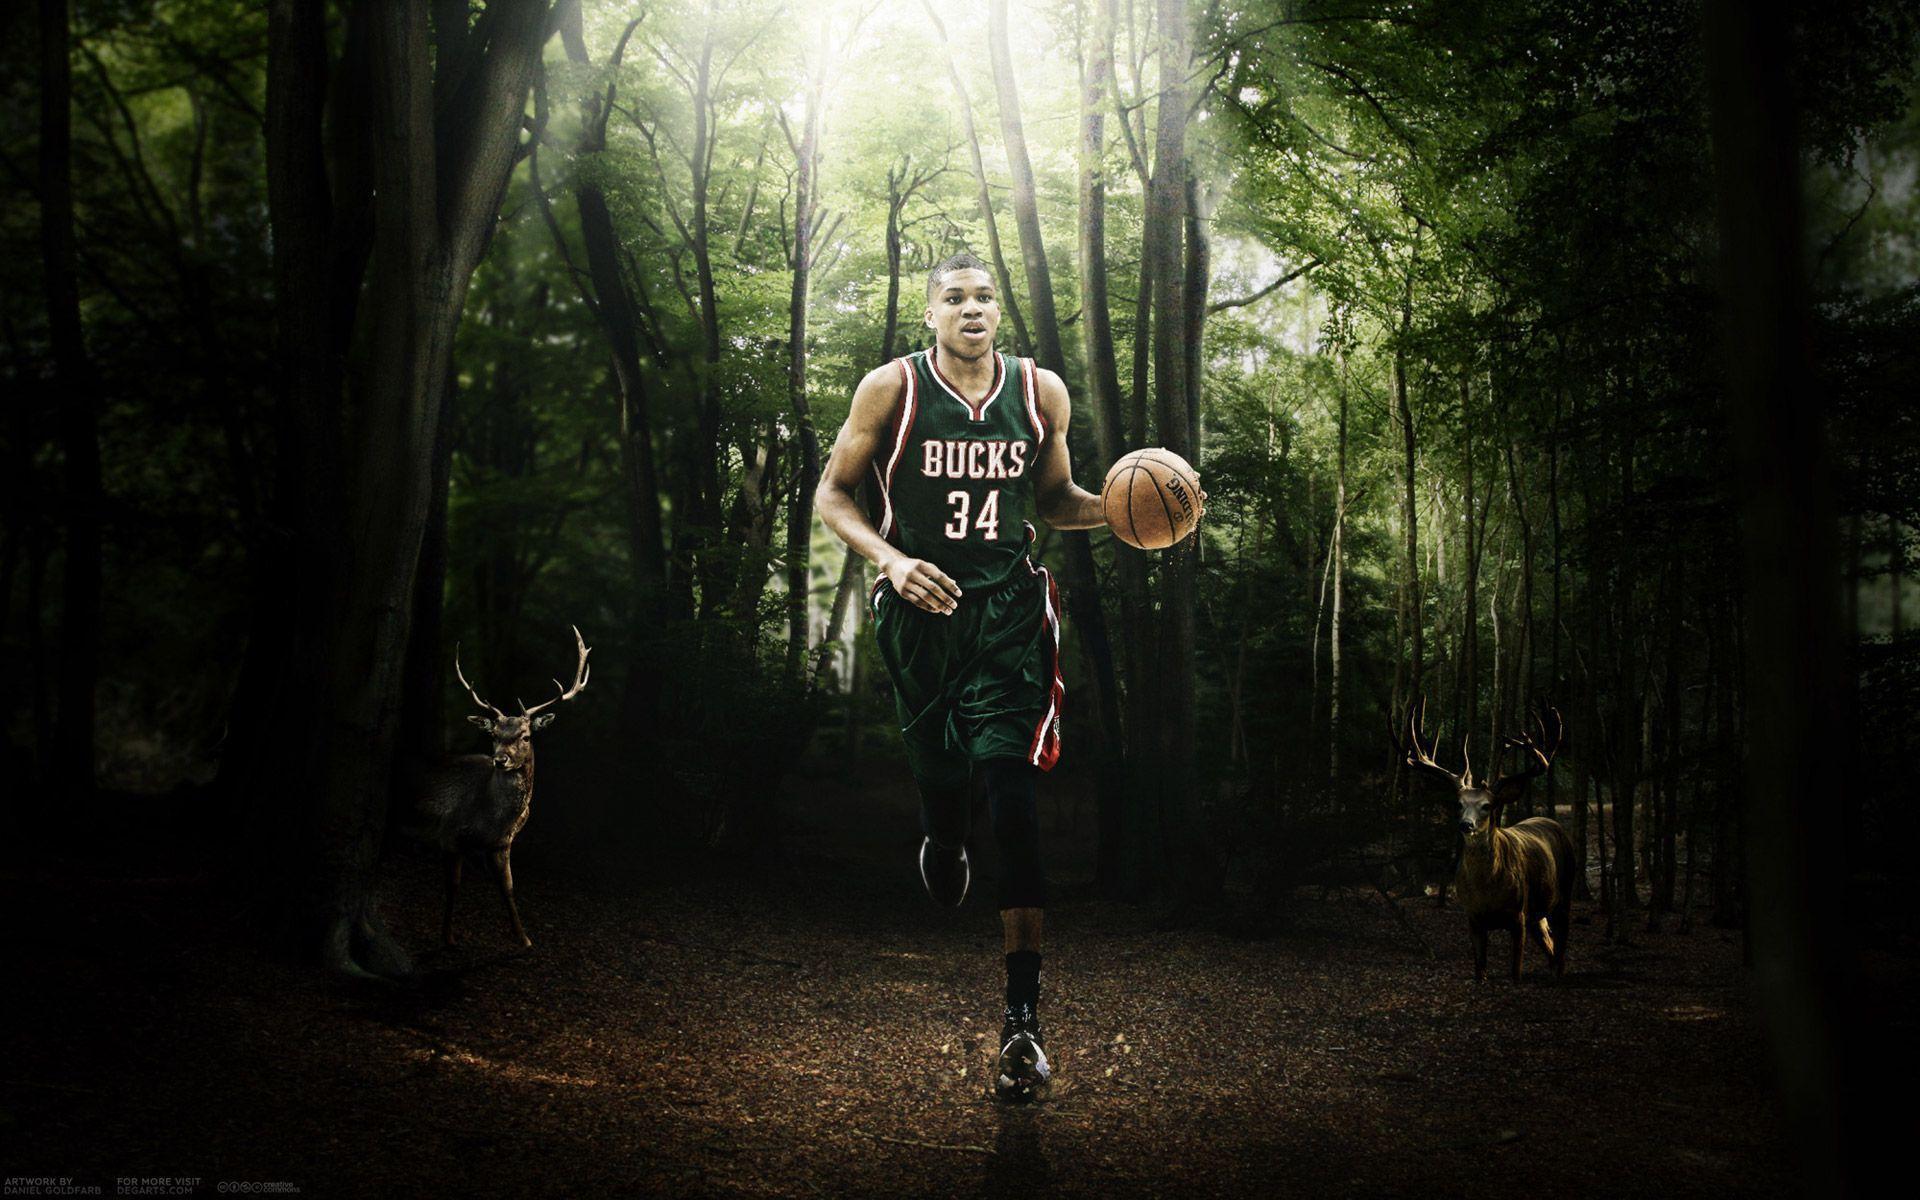 Giannis Antetokounmpo Bucks 2015-2016 Wallpaper | Basketball ...